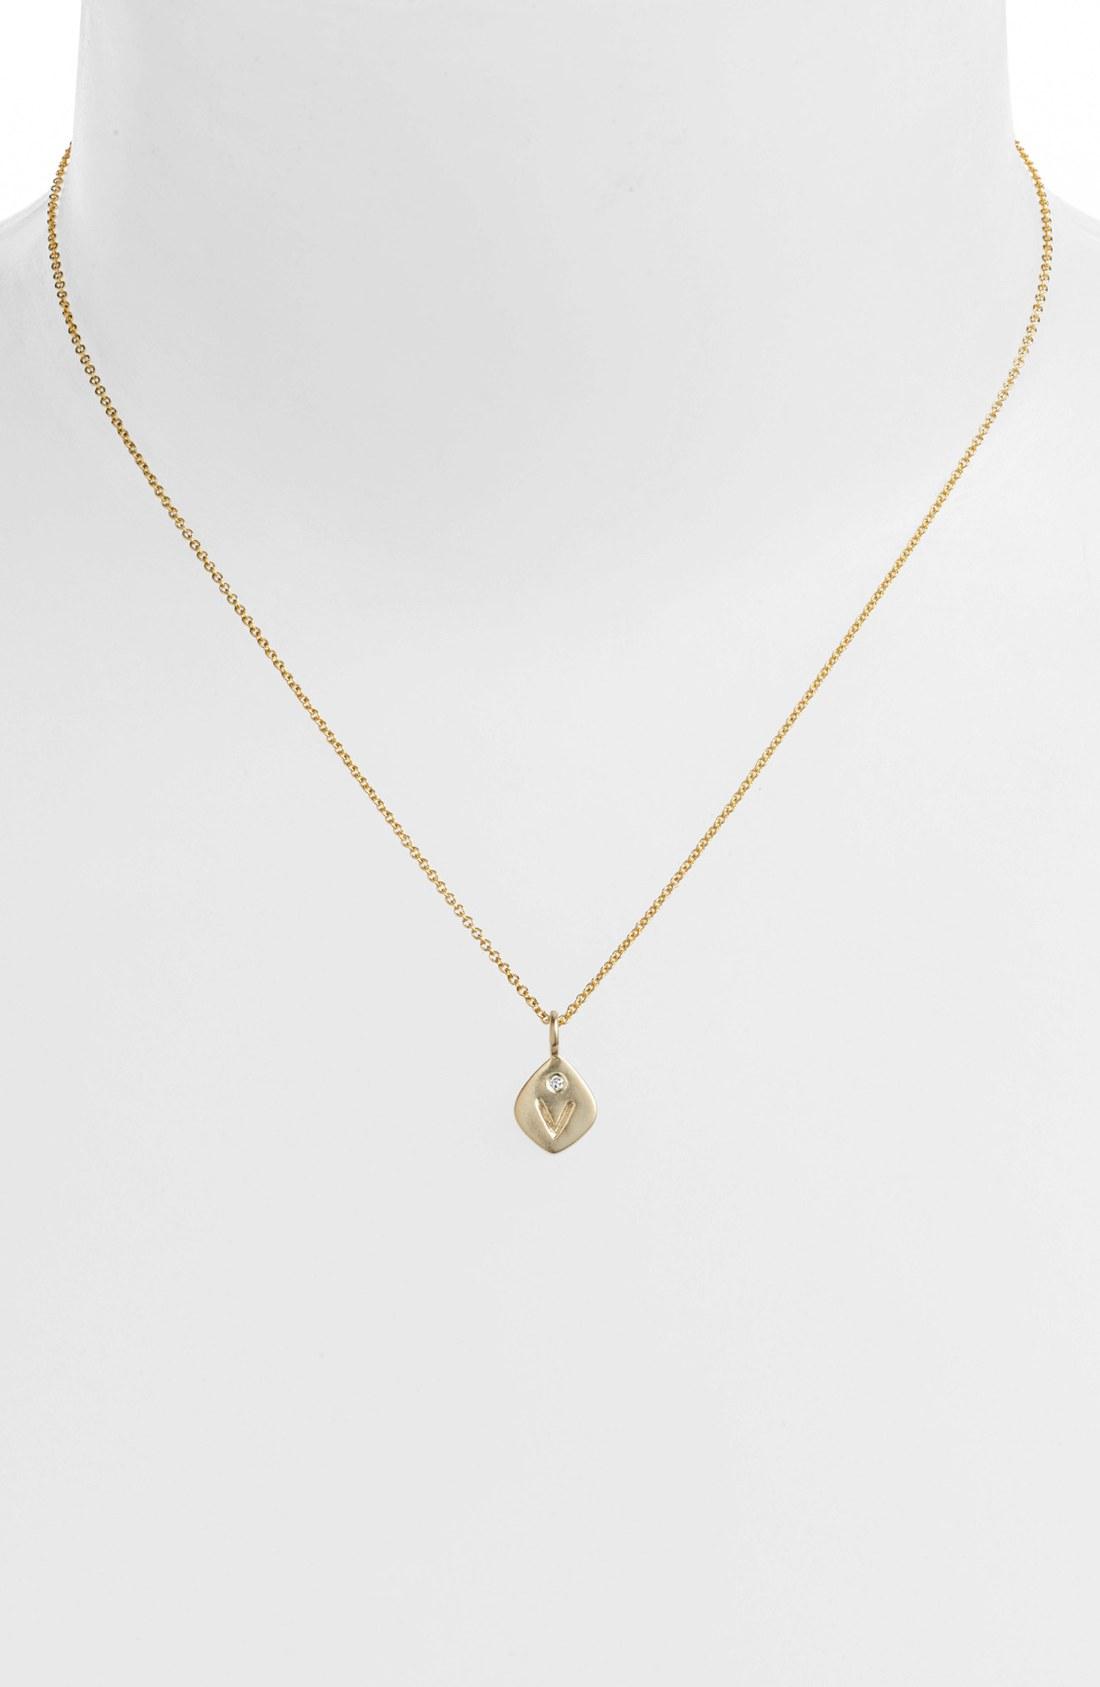 nunu designs small initial pendant necklace in gold v